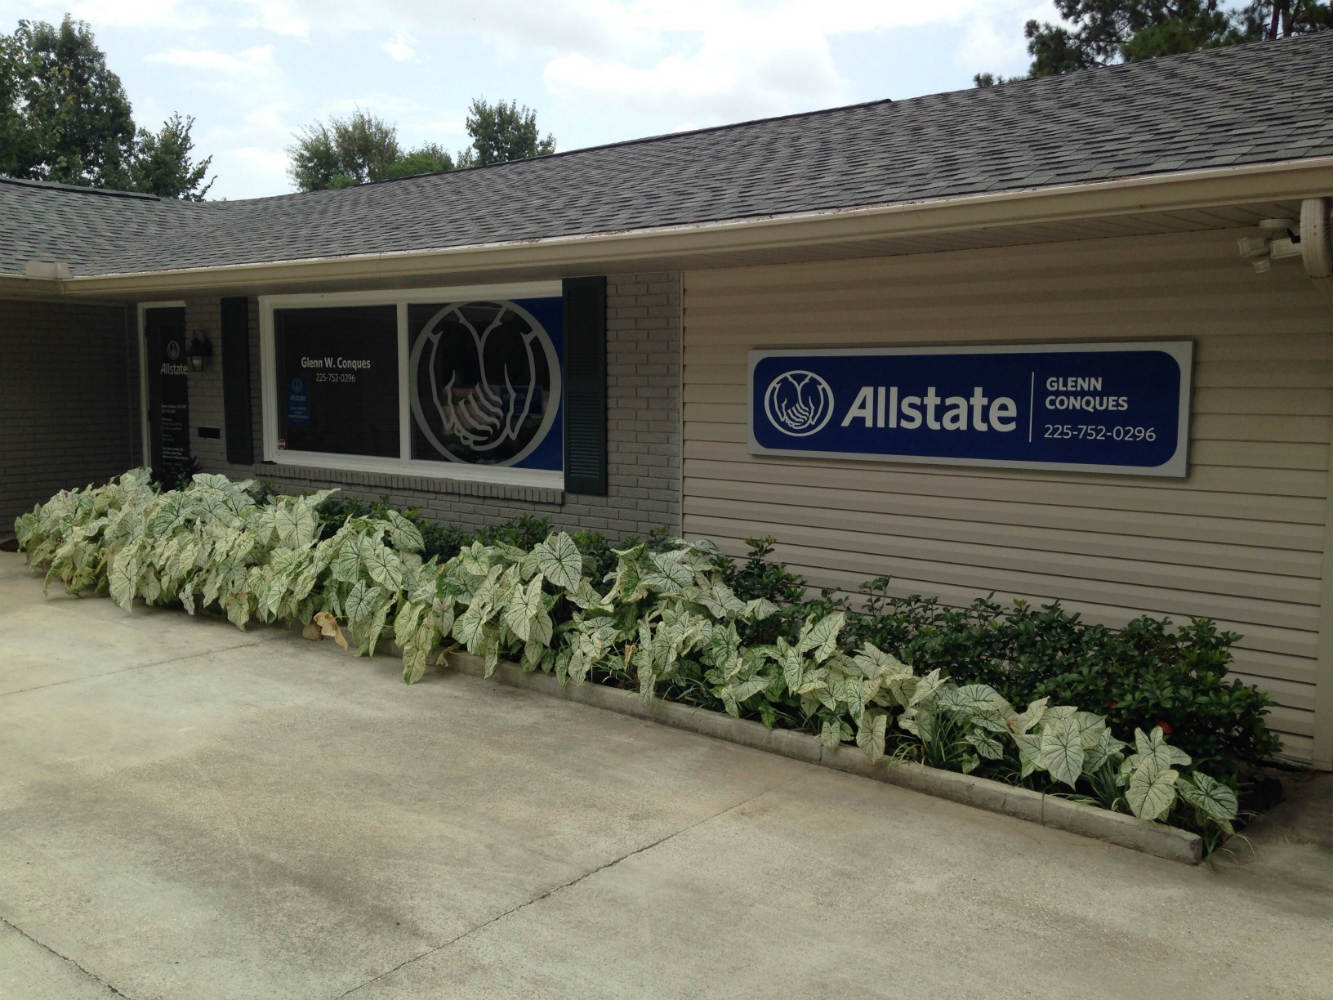 Glenn Conques: Allstate Insurance image 2